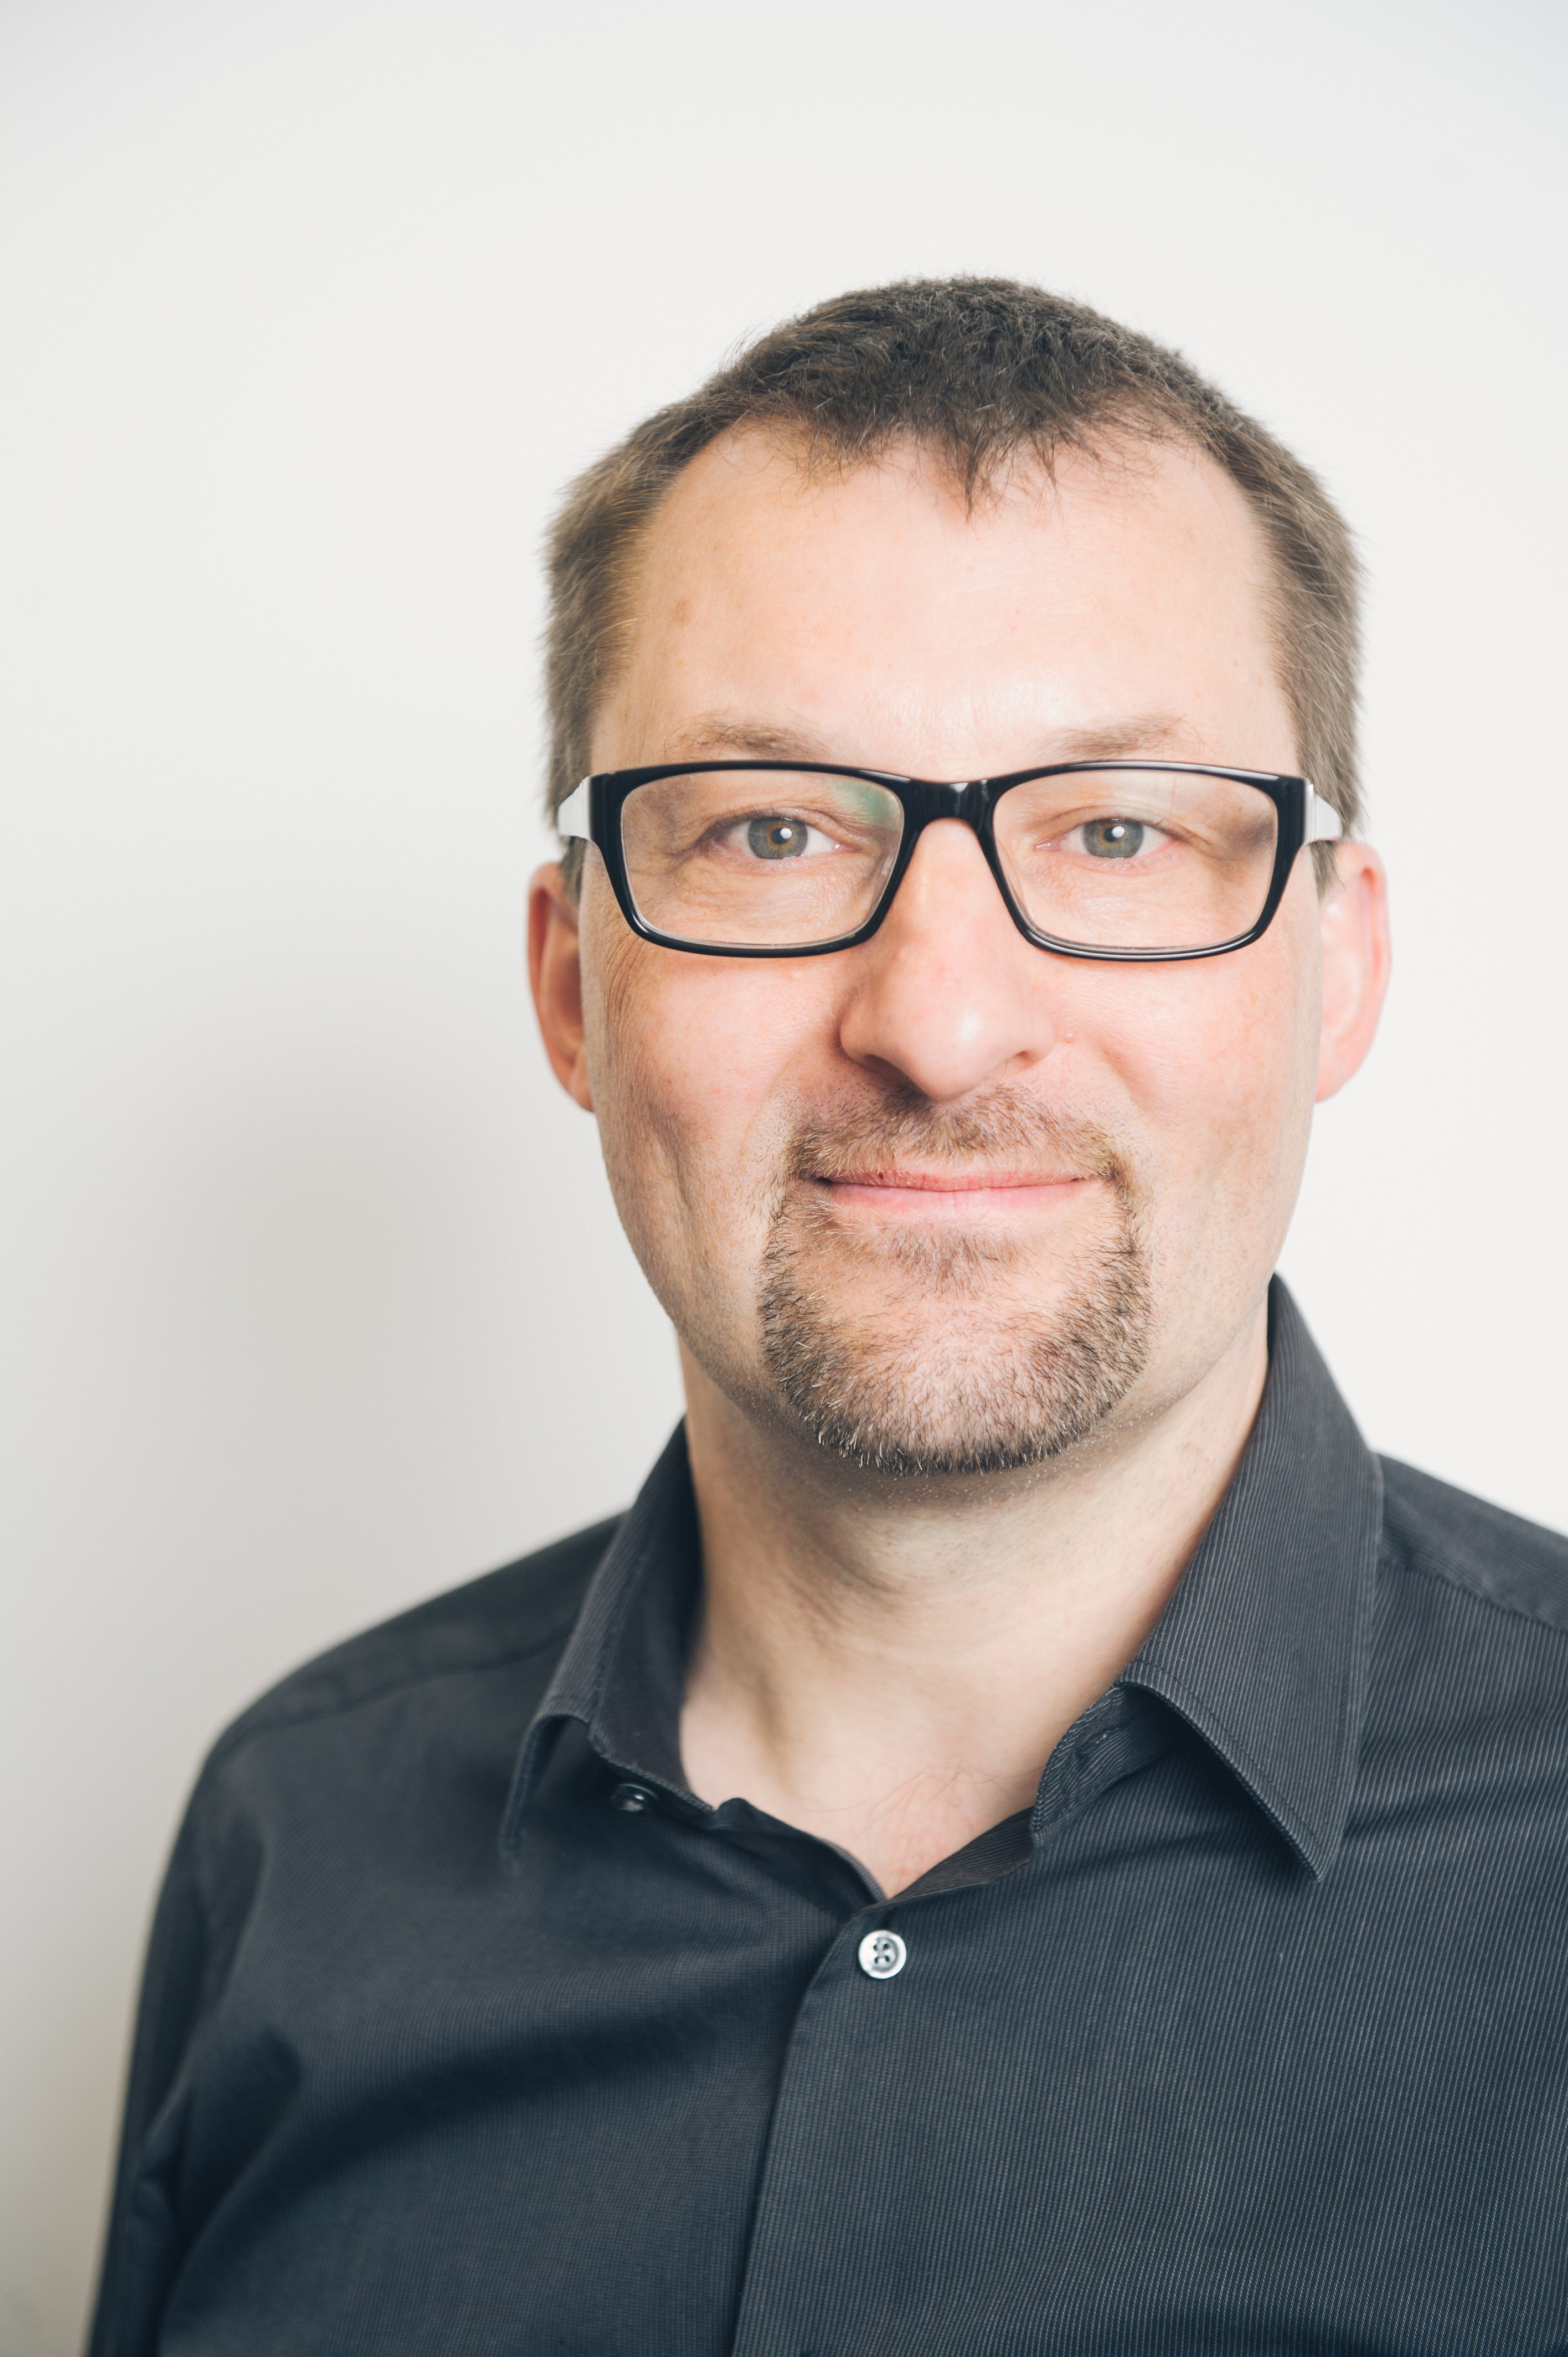 Urologe Frechen Königsdorf Dr. med. Markus Lausberg Portrait